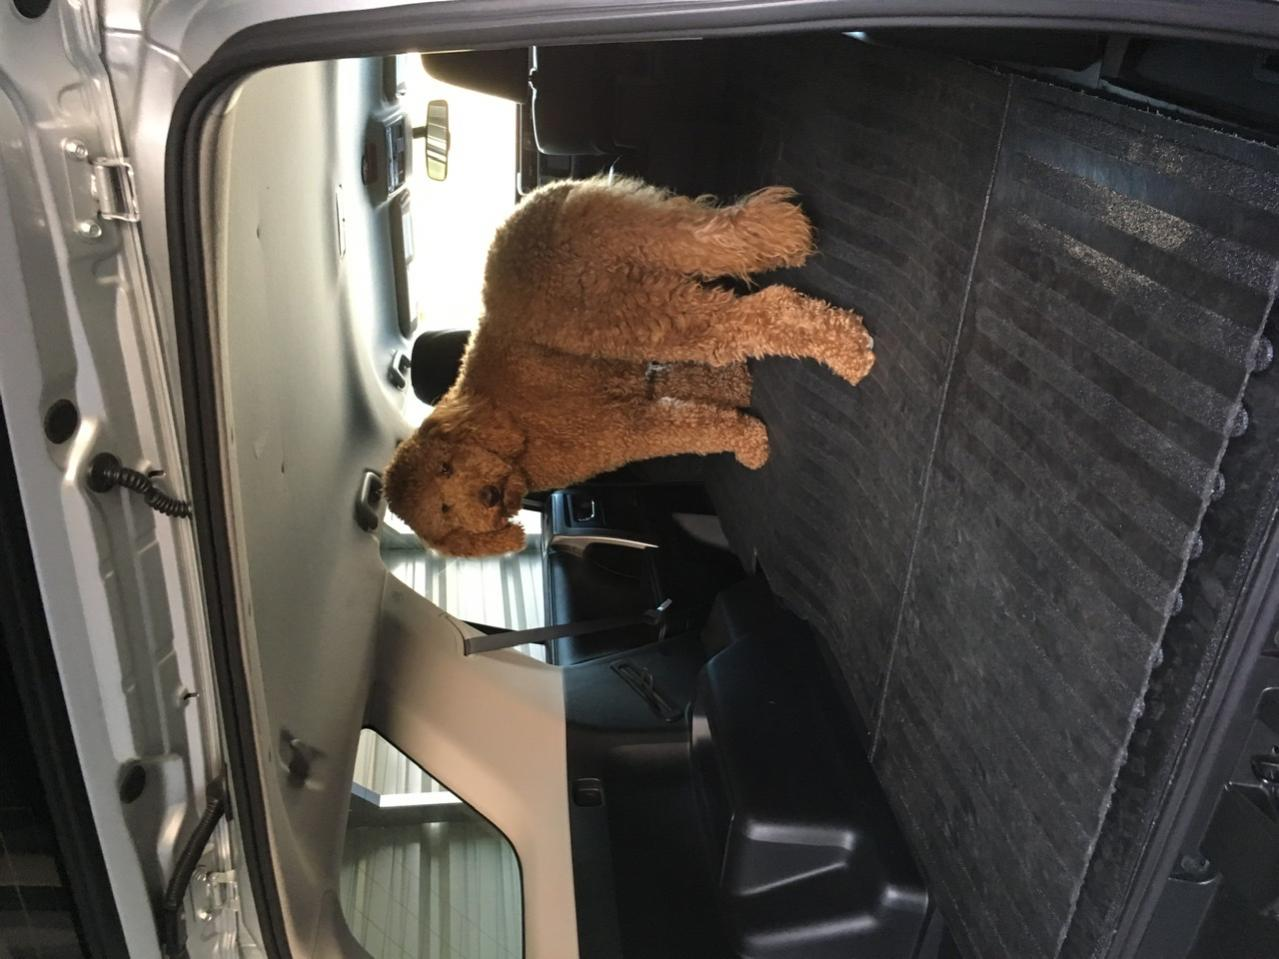 Show off your Dog, Ultimate 4Runner Dog thread-f9a19a5a-ba1b-4461-8ca7-b28aafc004c1-jpg